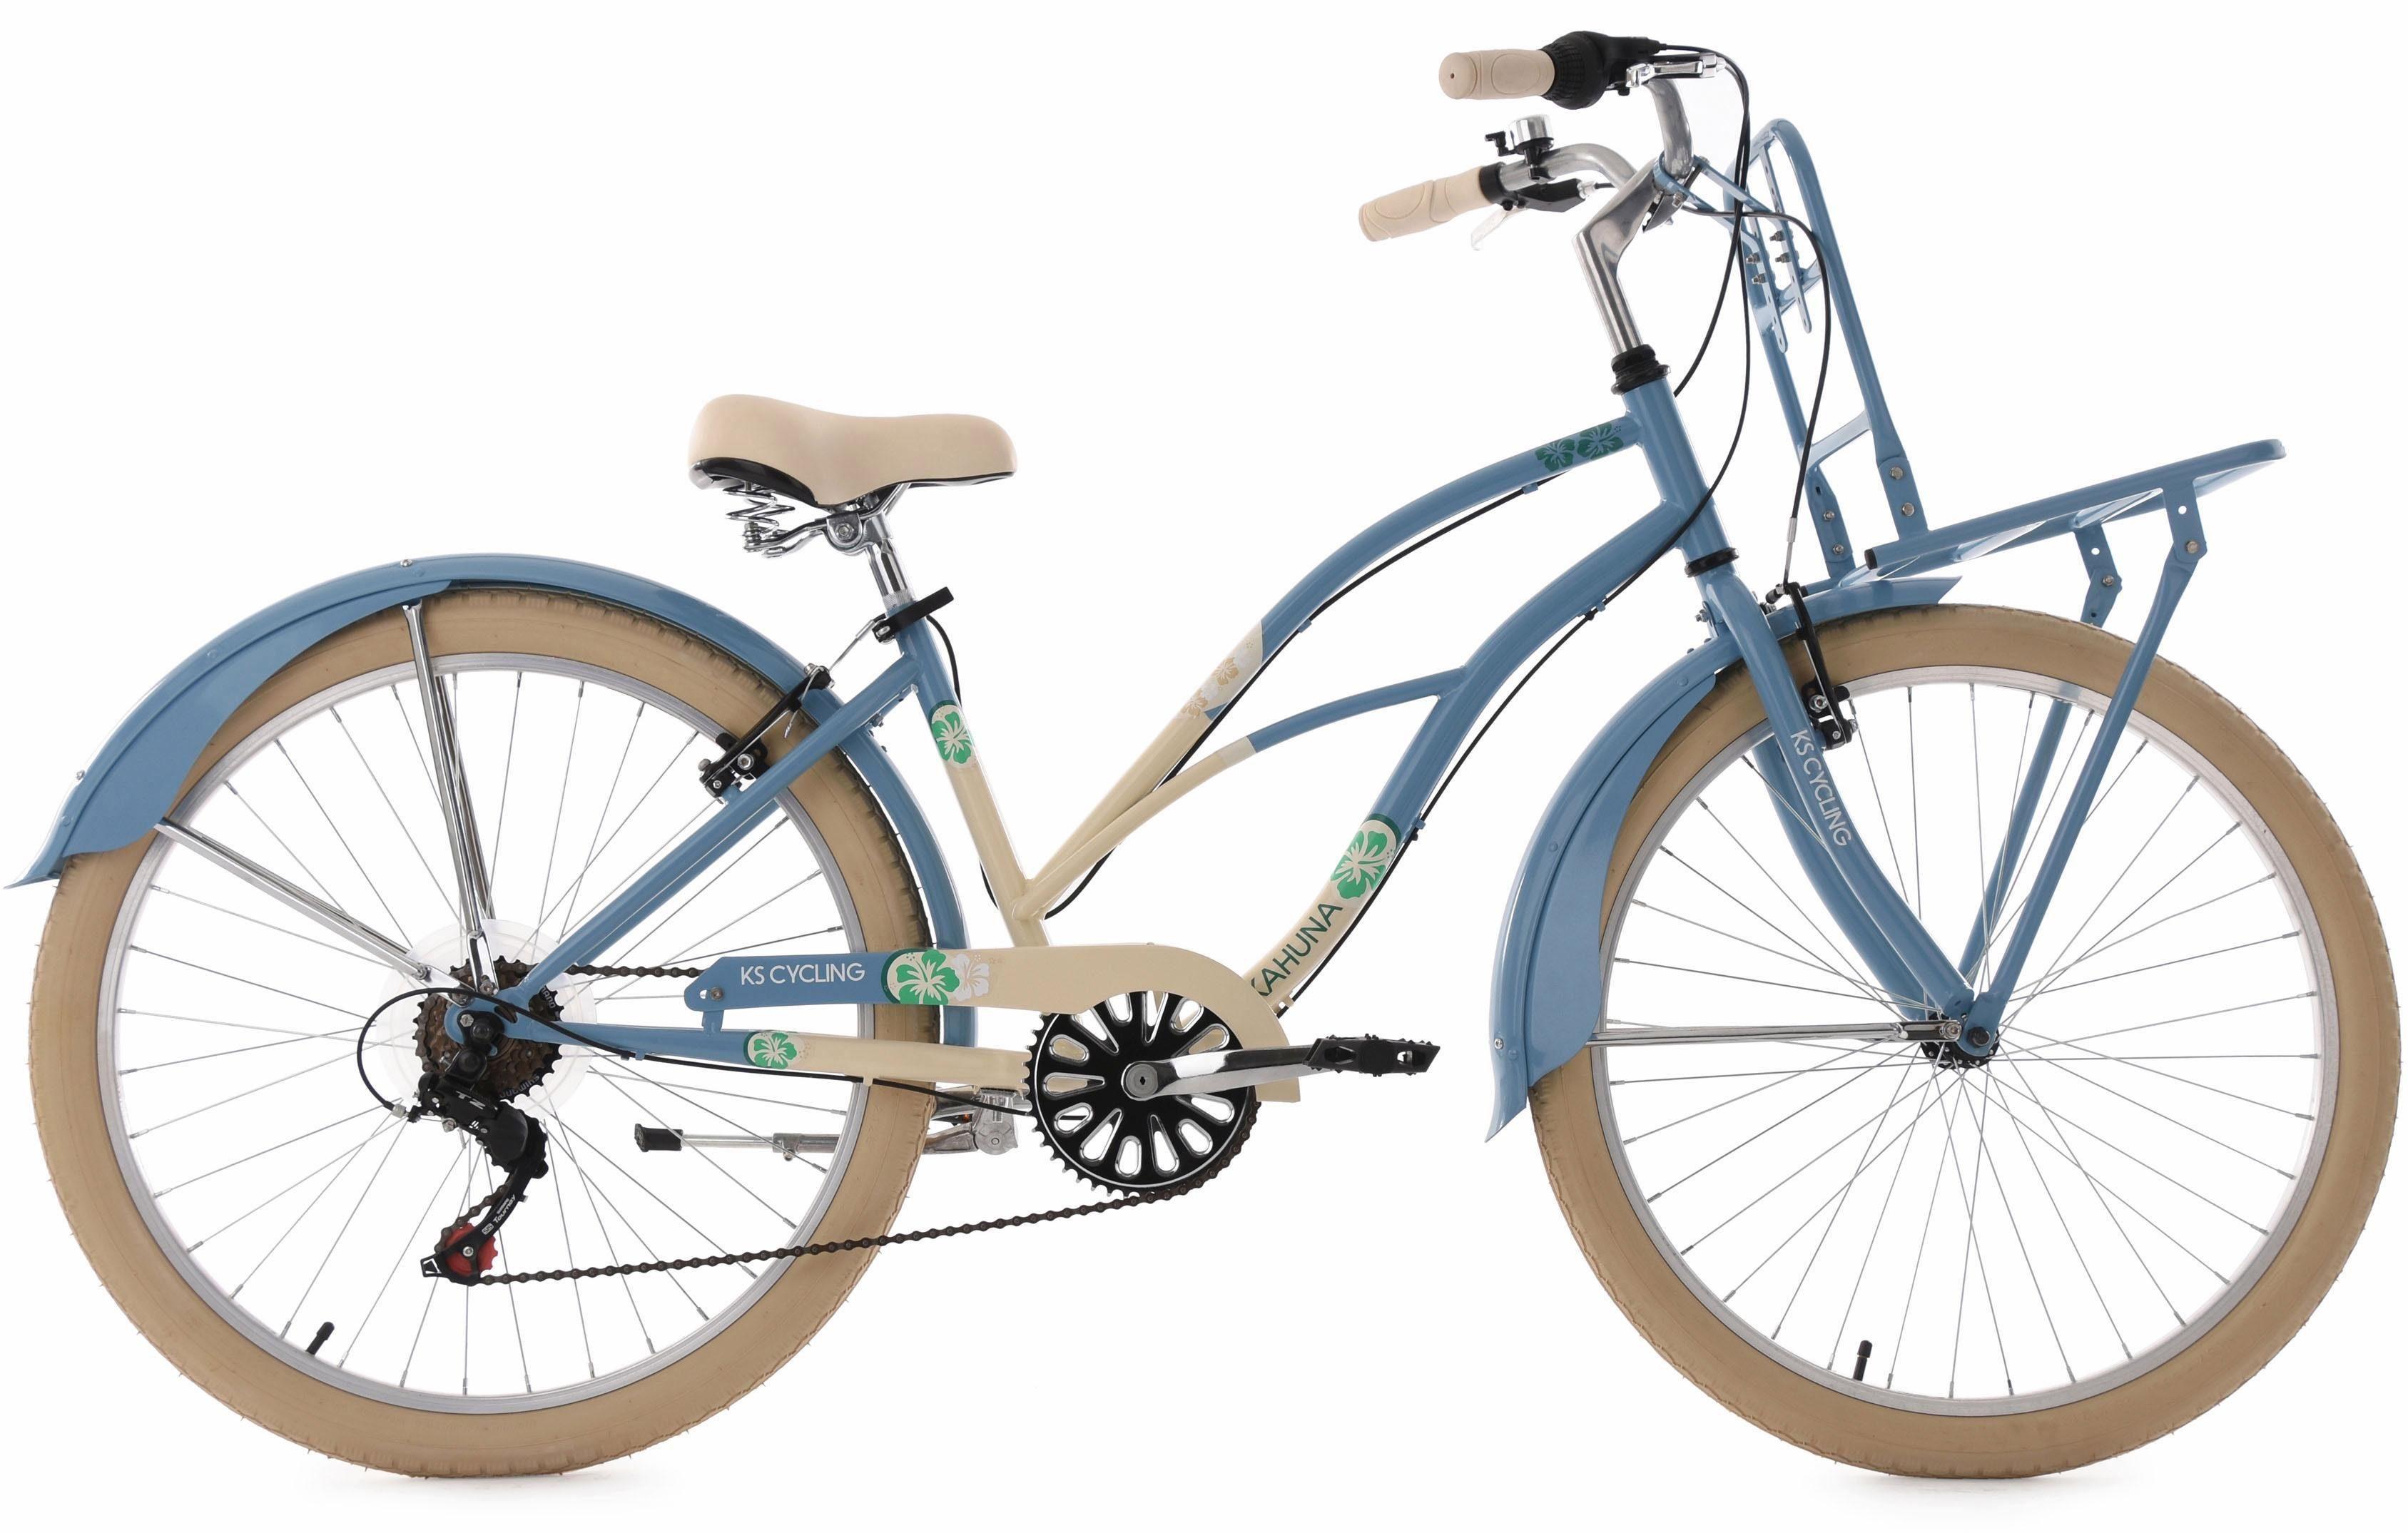 KS Cycling Beachcruiser, 26 Zoll, blau-beige, 6 Gang-Shimano Tourney Schaltwerk, »Kahuna«